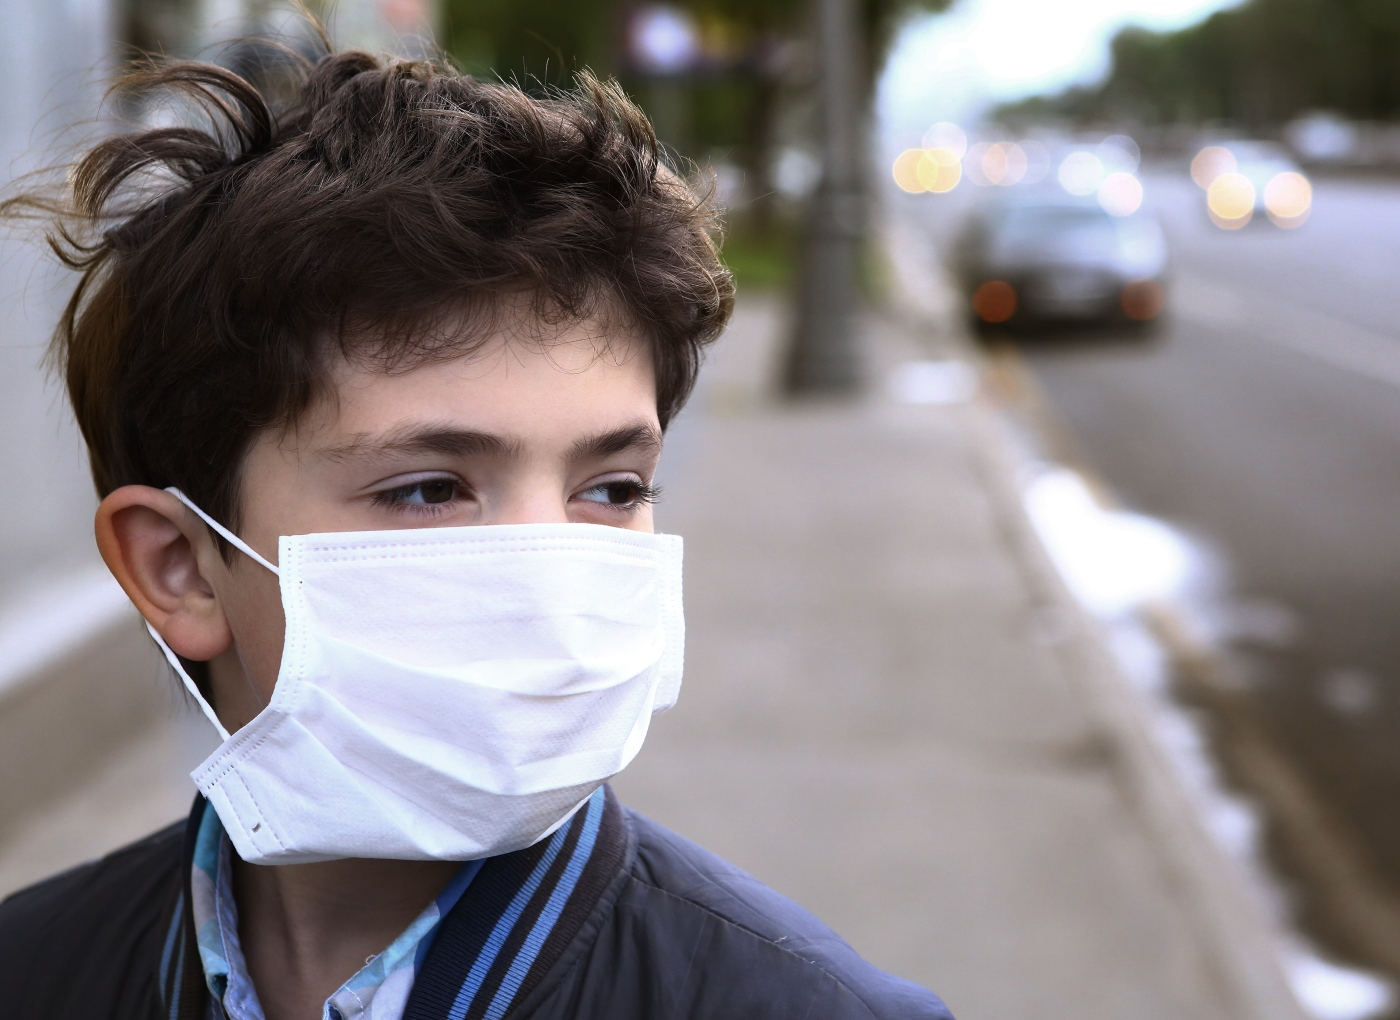 COVID-19: rapaz com máscara protetora